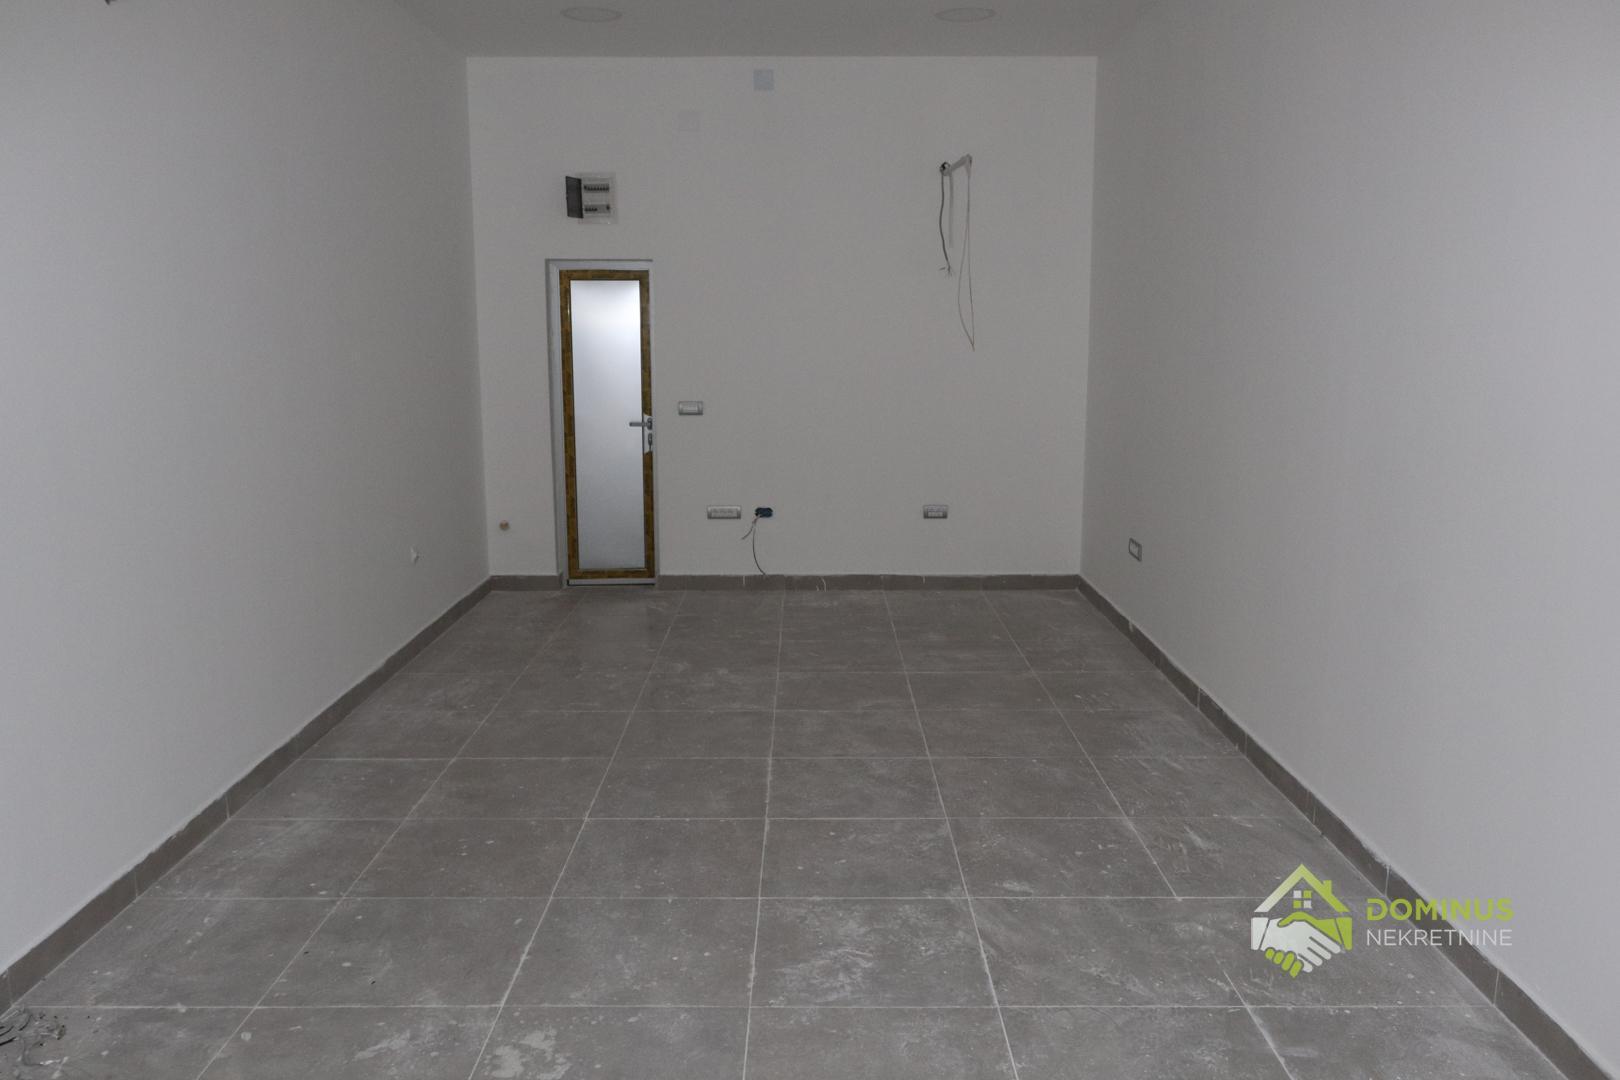 Poslovni prostor 35m2, Centar Aranđelovac